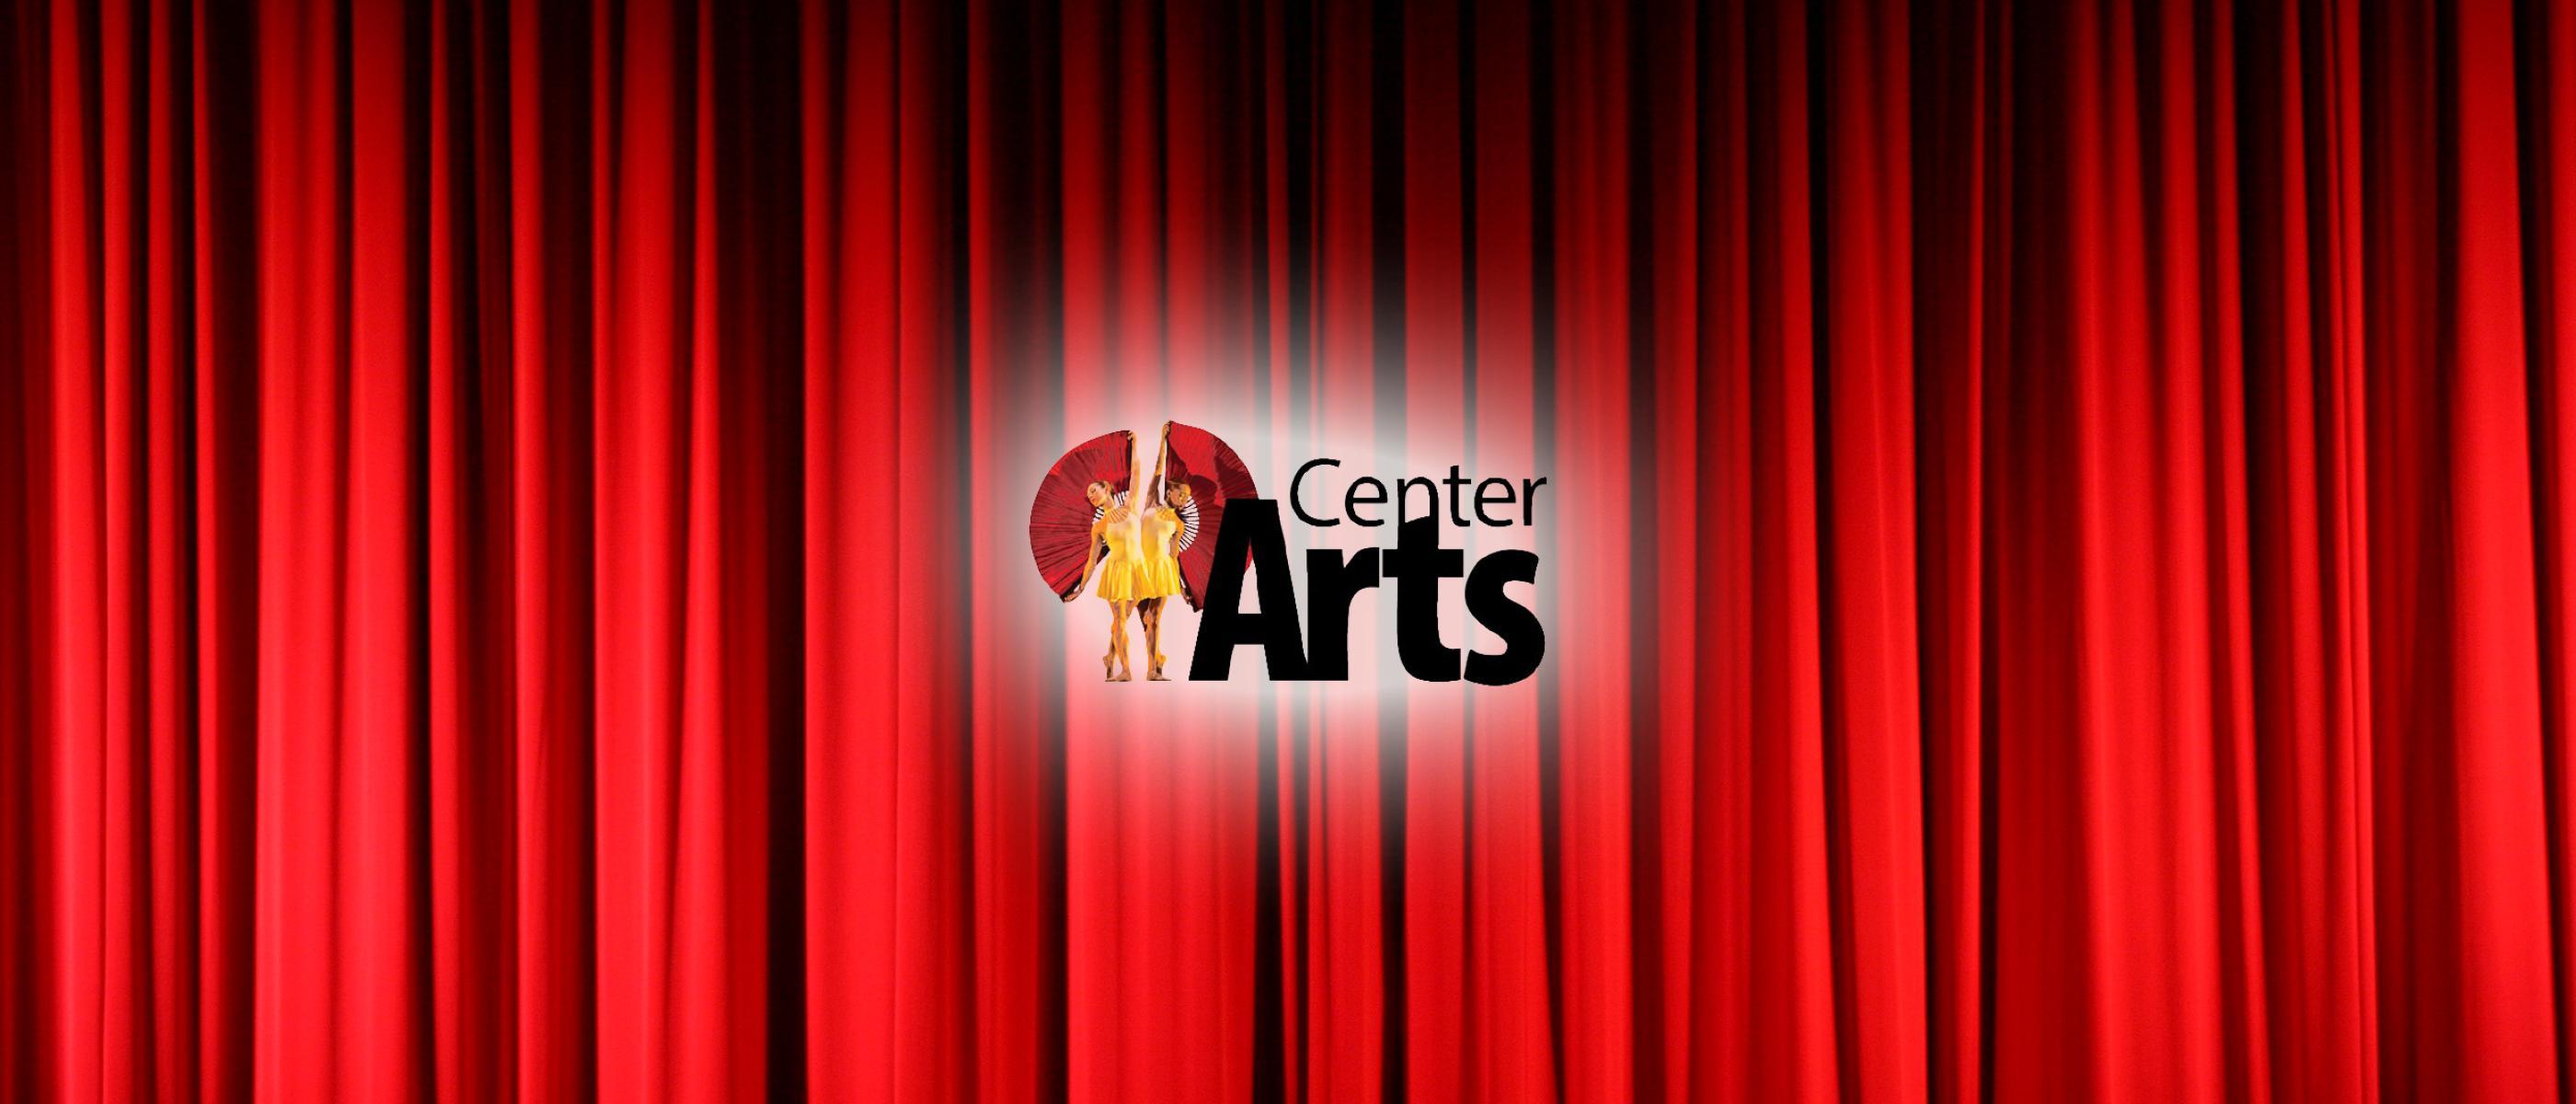 Center Arts